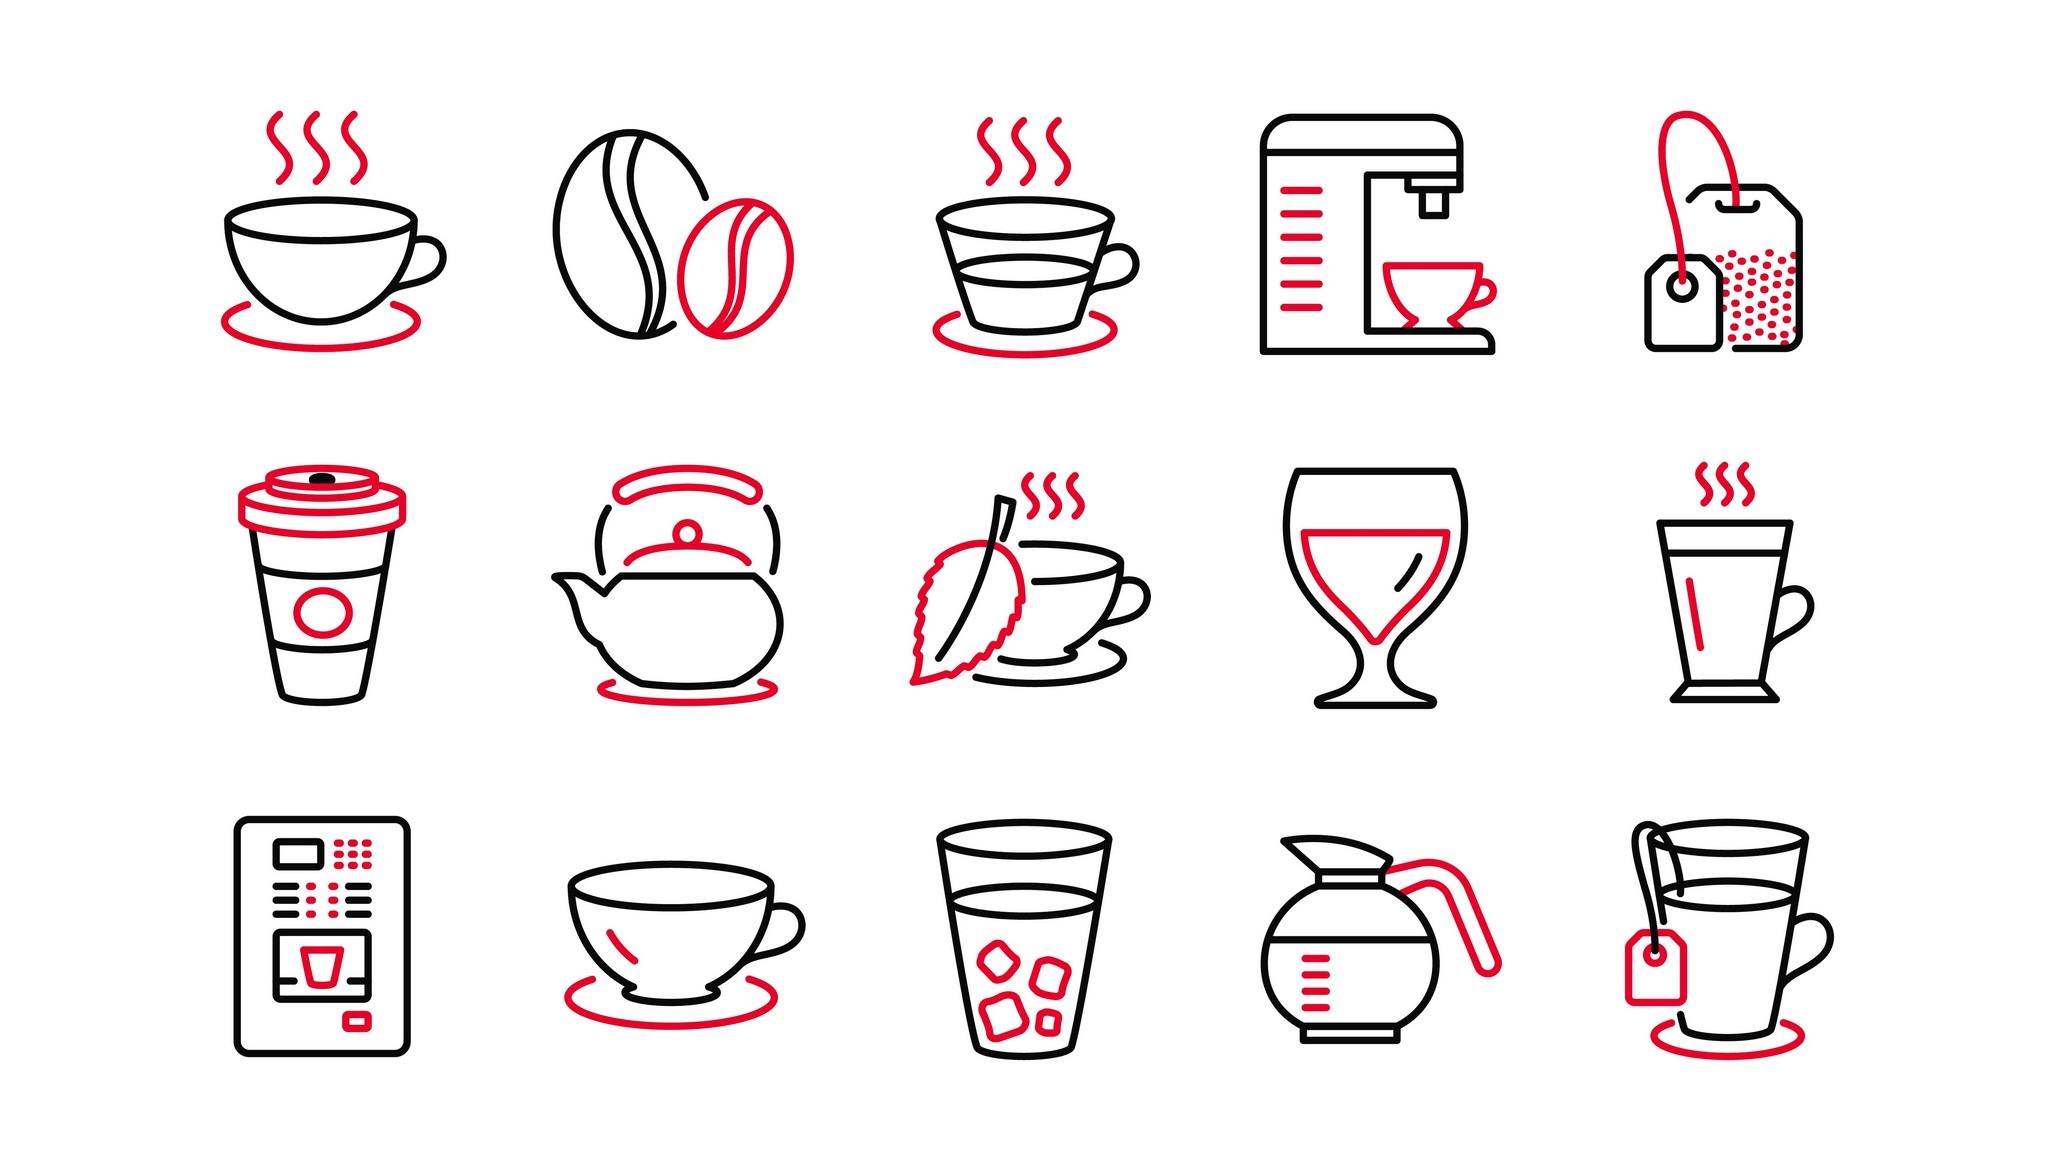 Augusta Micro-Market Service | Coffee Equipment | Promote Productivity